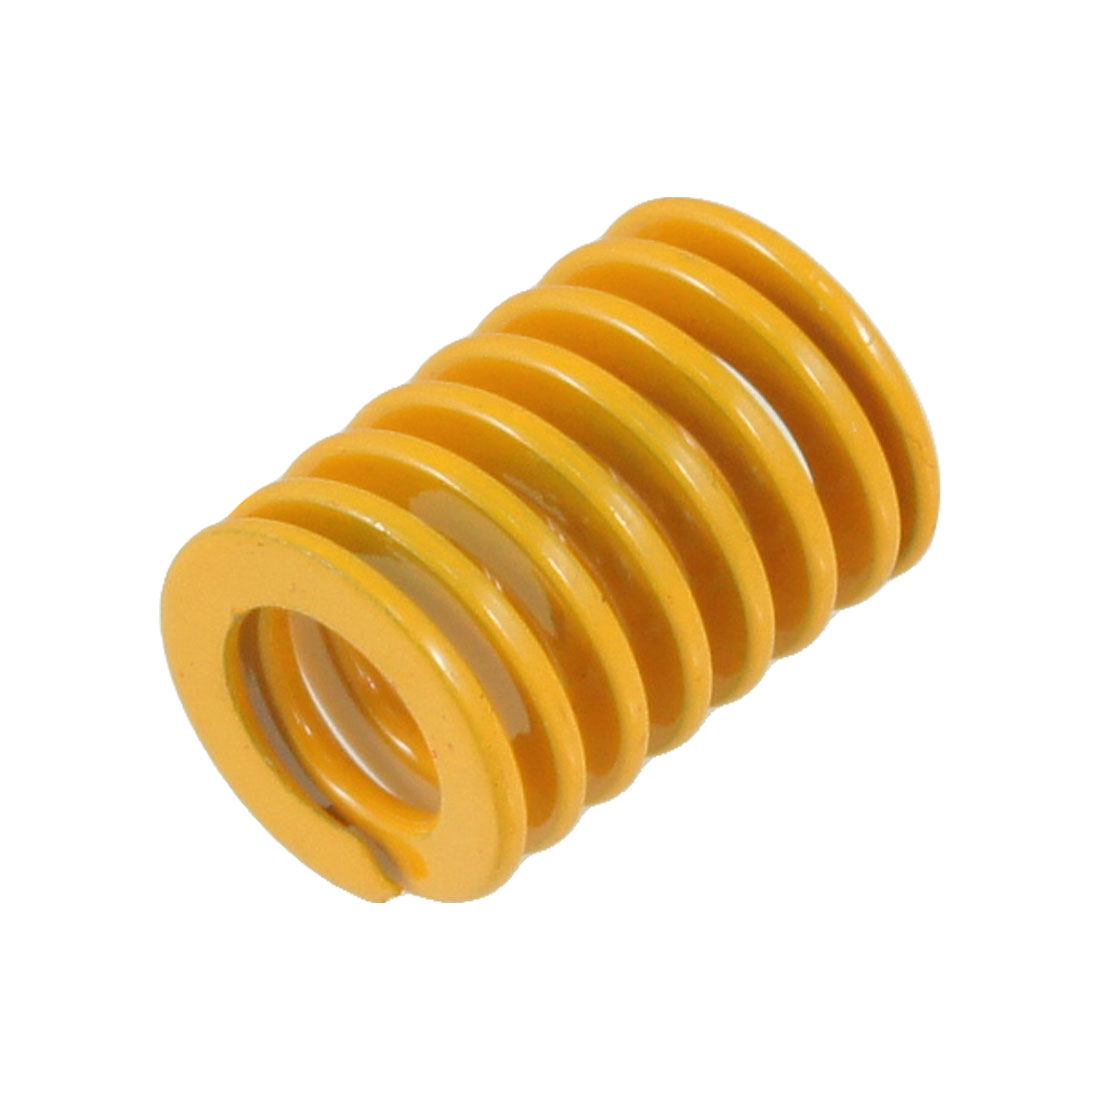 Orange 18mm x 10.5mm x 25mm Metal Tubular Section Mould Die Spring